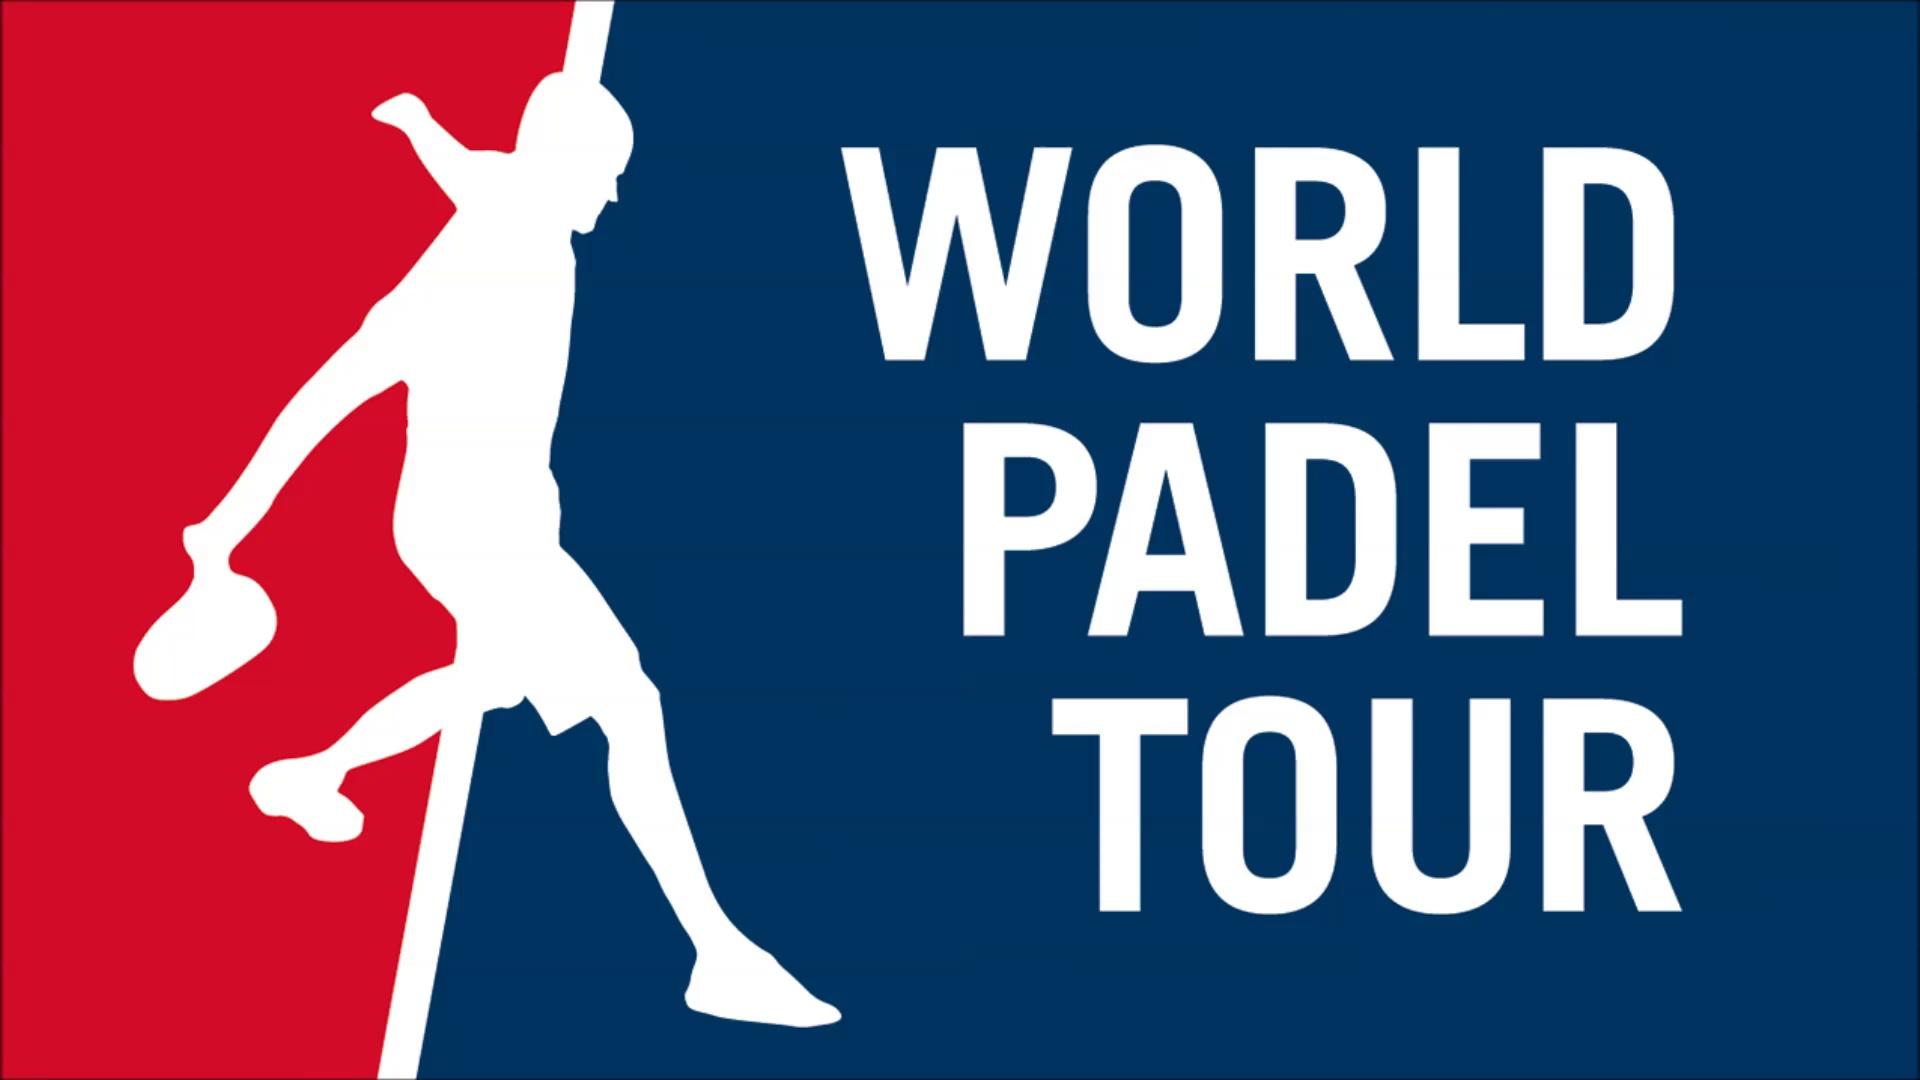 World Padel Tour in 2016 - PadelCentrum.nl